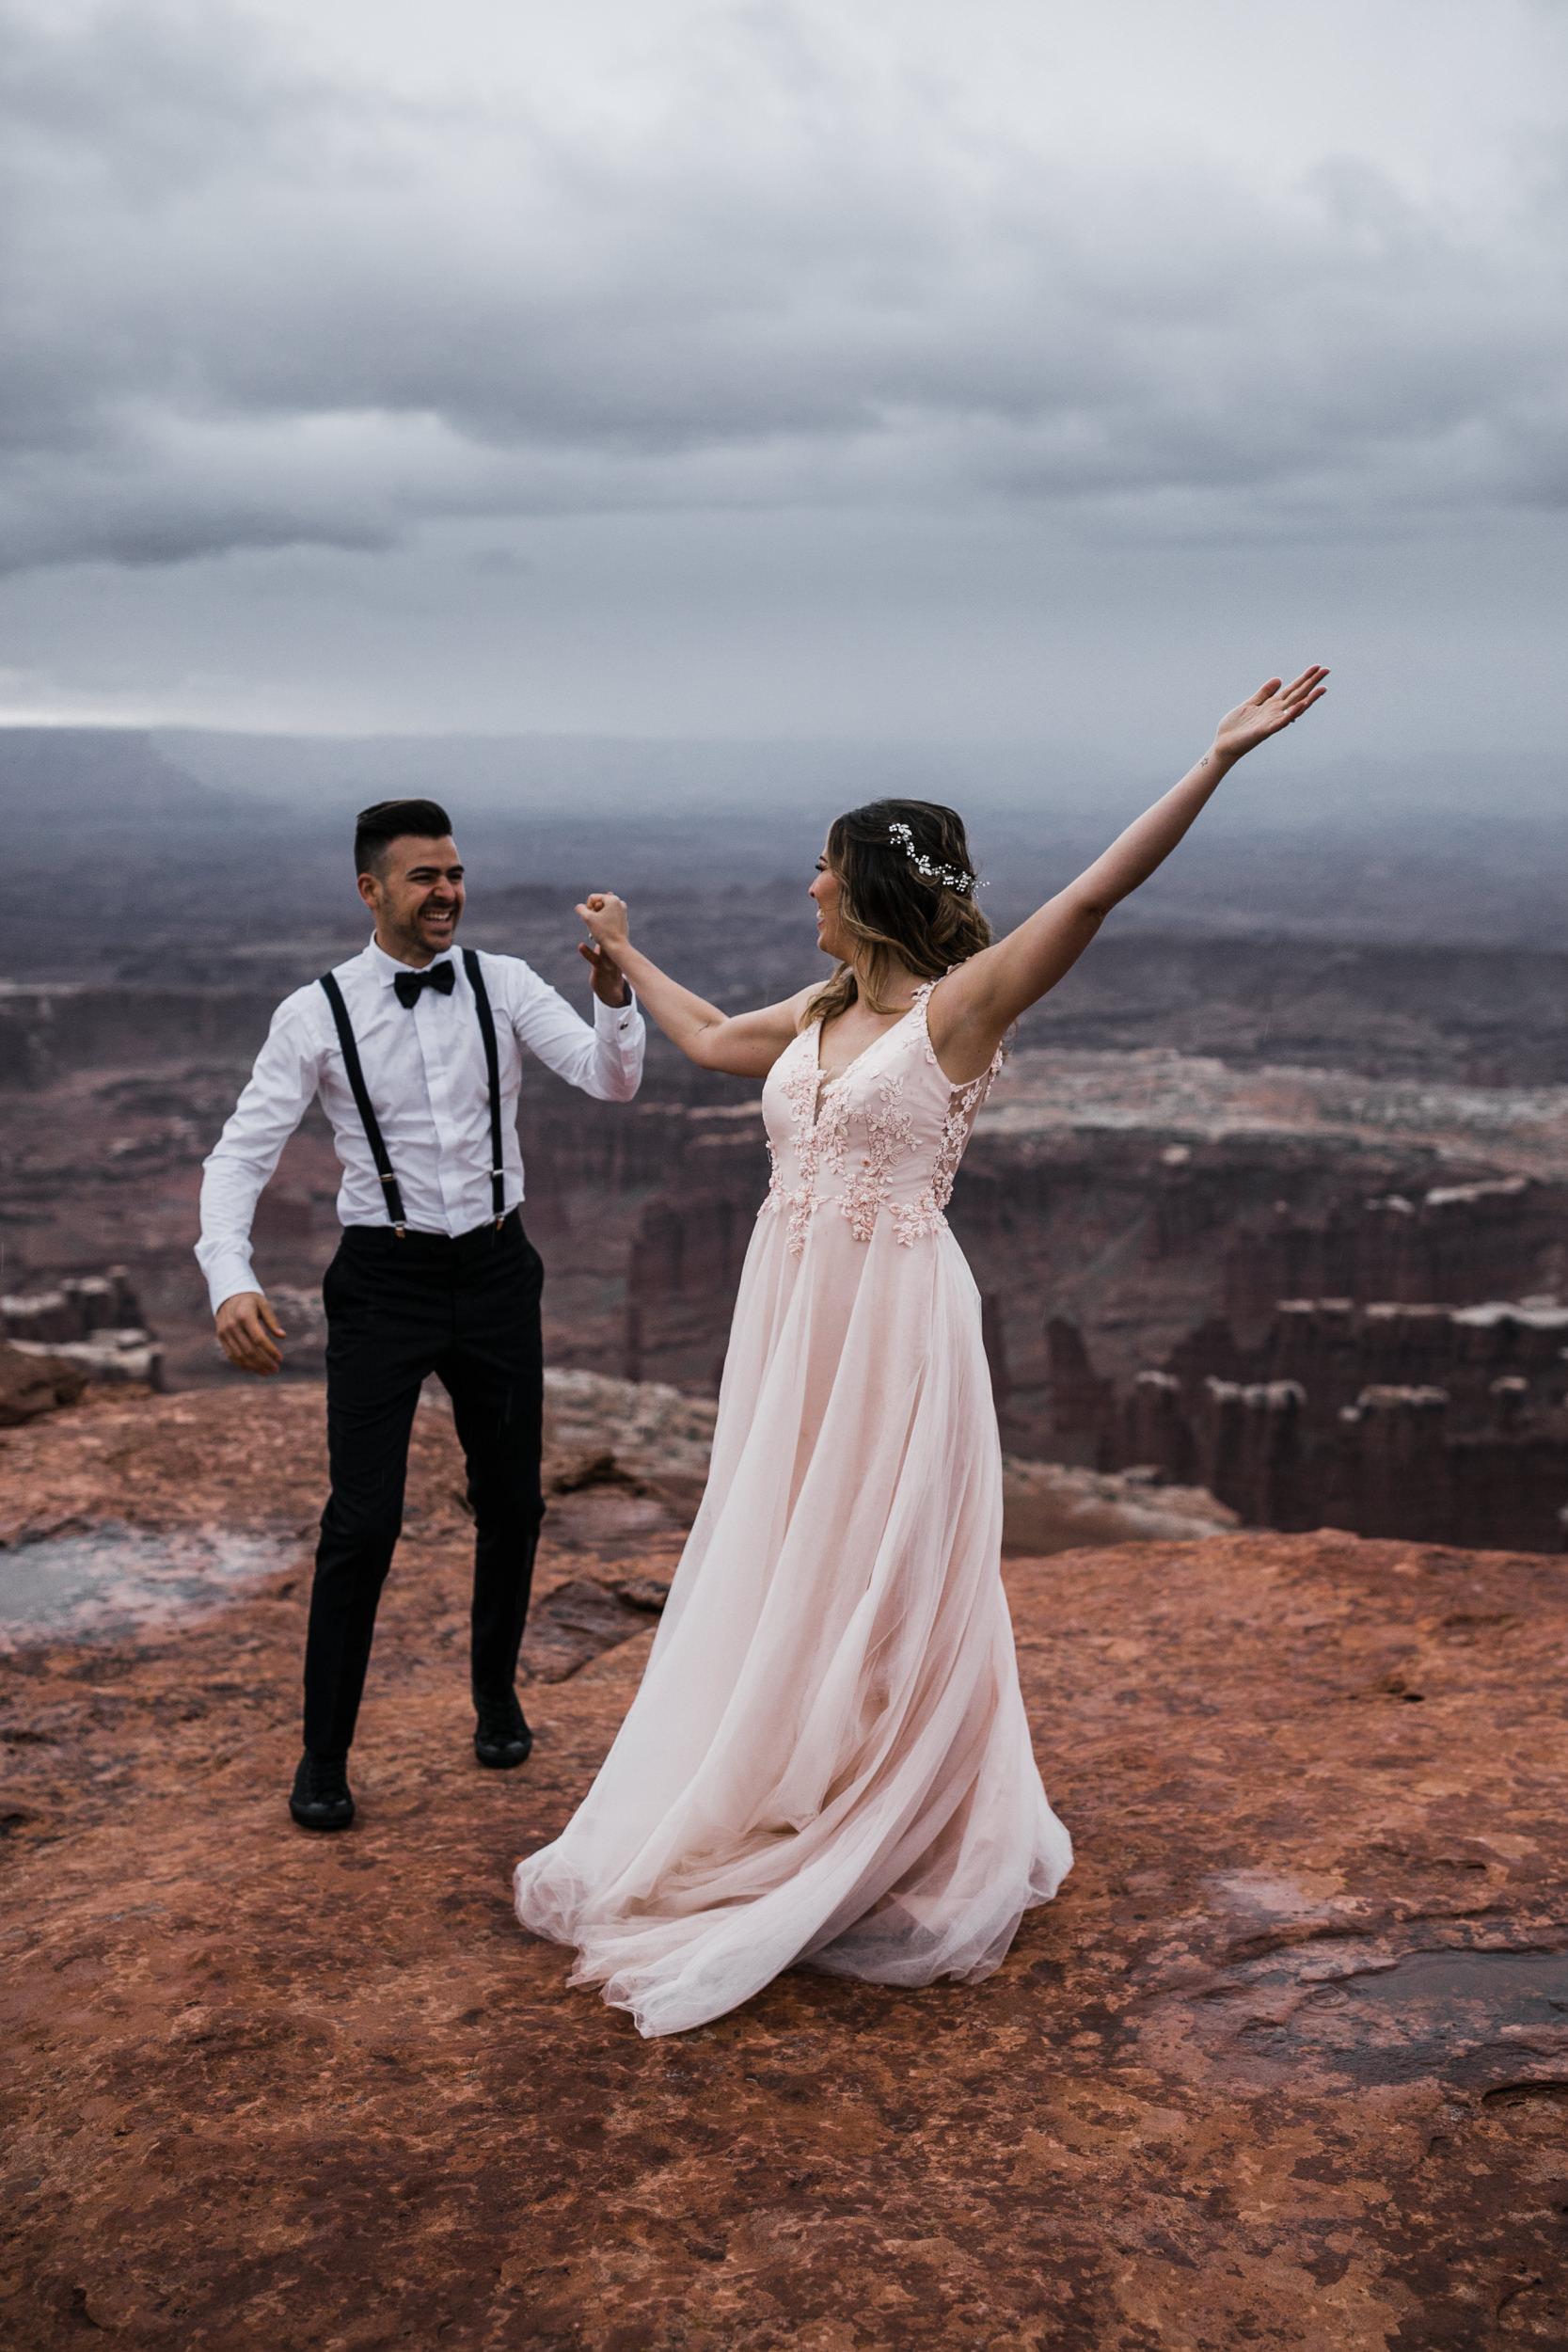 Hearnes-Elopement-Photography-Canyonlands-National-Park-Moab-Wedding-34.jpg